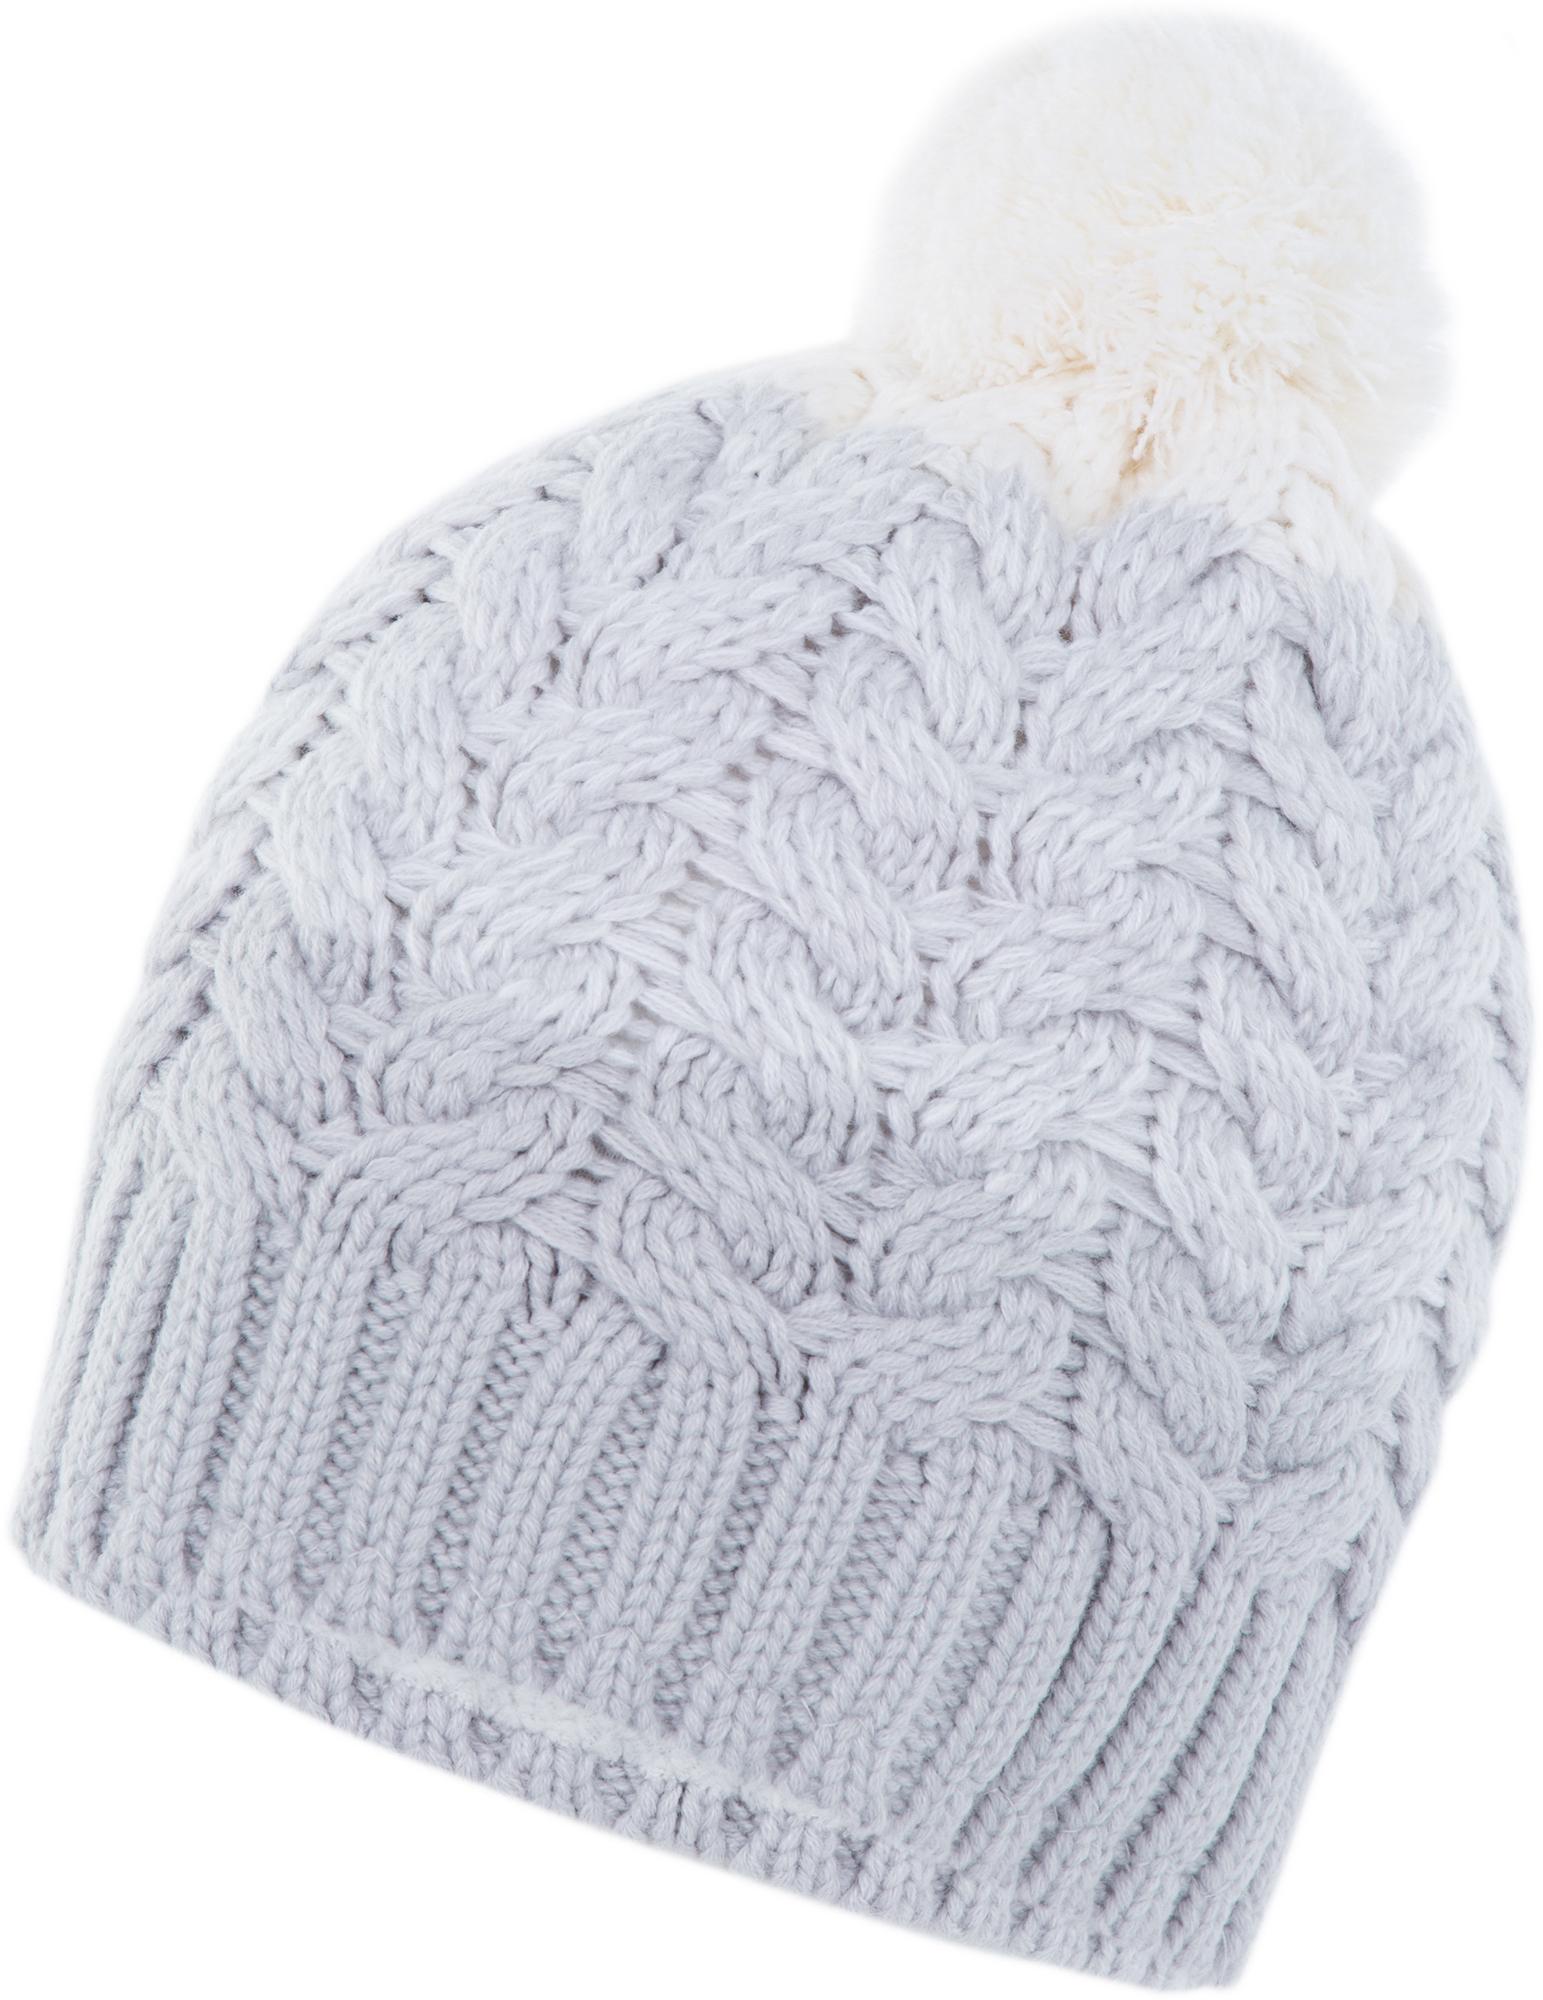 Salomon Шапка женская Salomon Poly Beanie шапка женская puma archive wm fold beanie цвет серый 02133402 размер универсальный